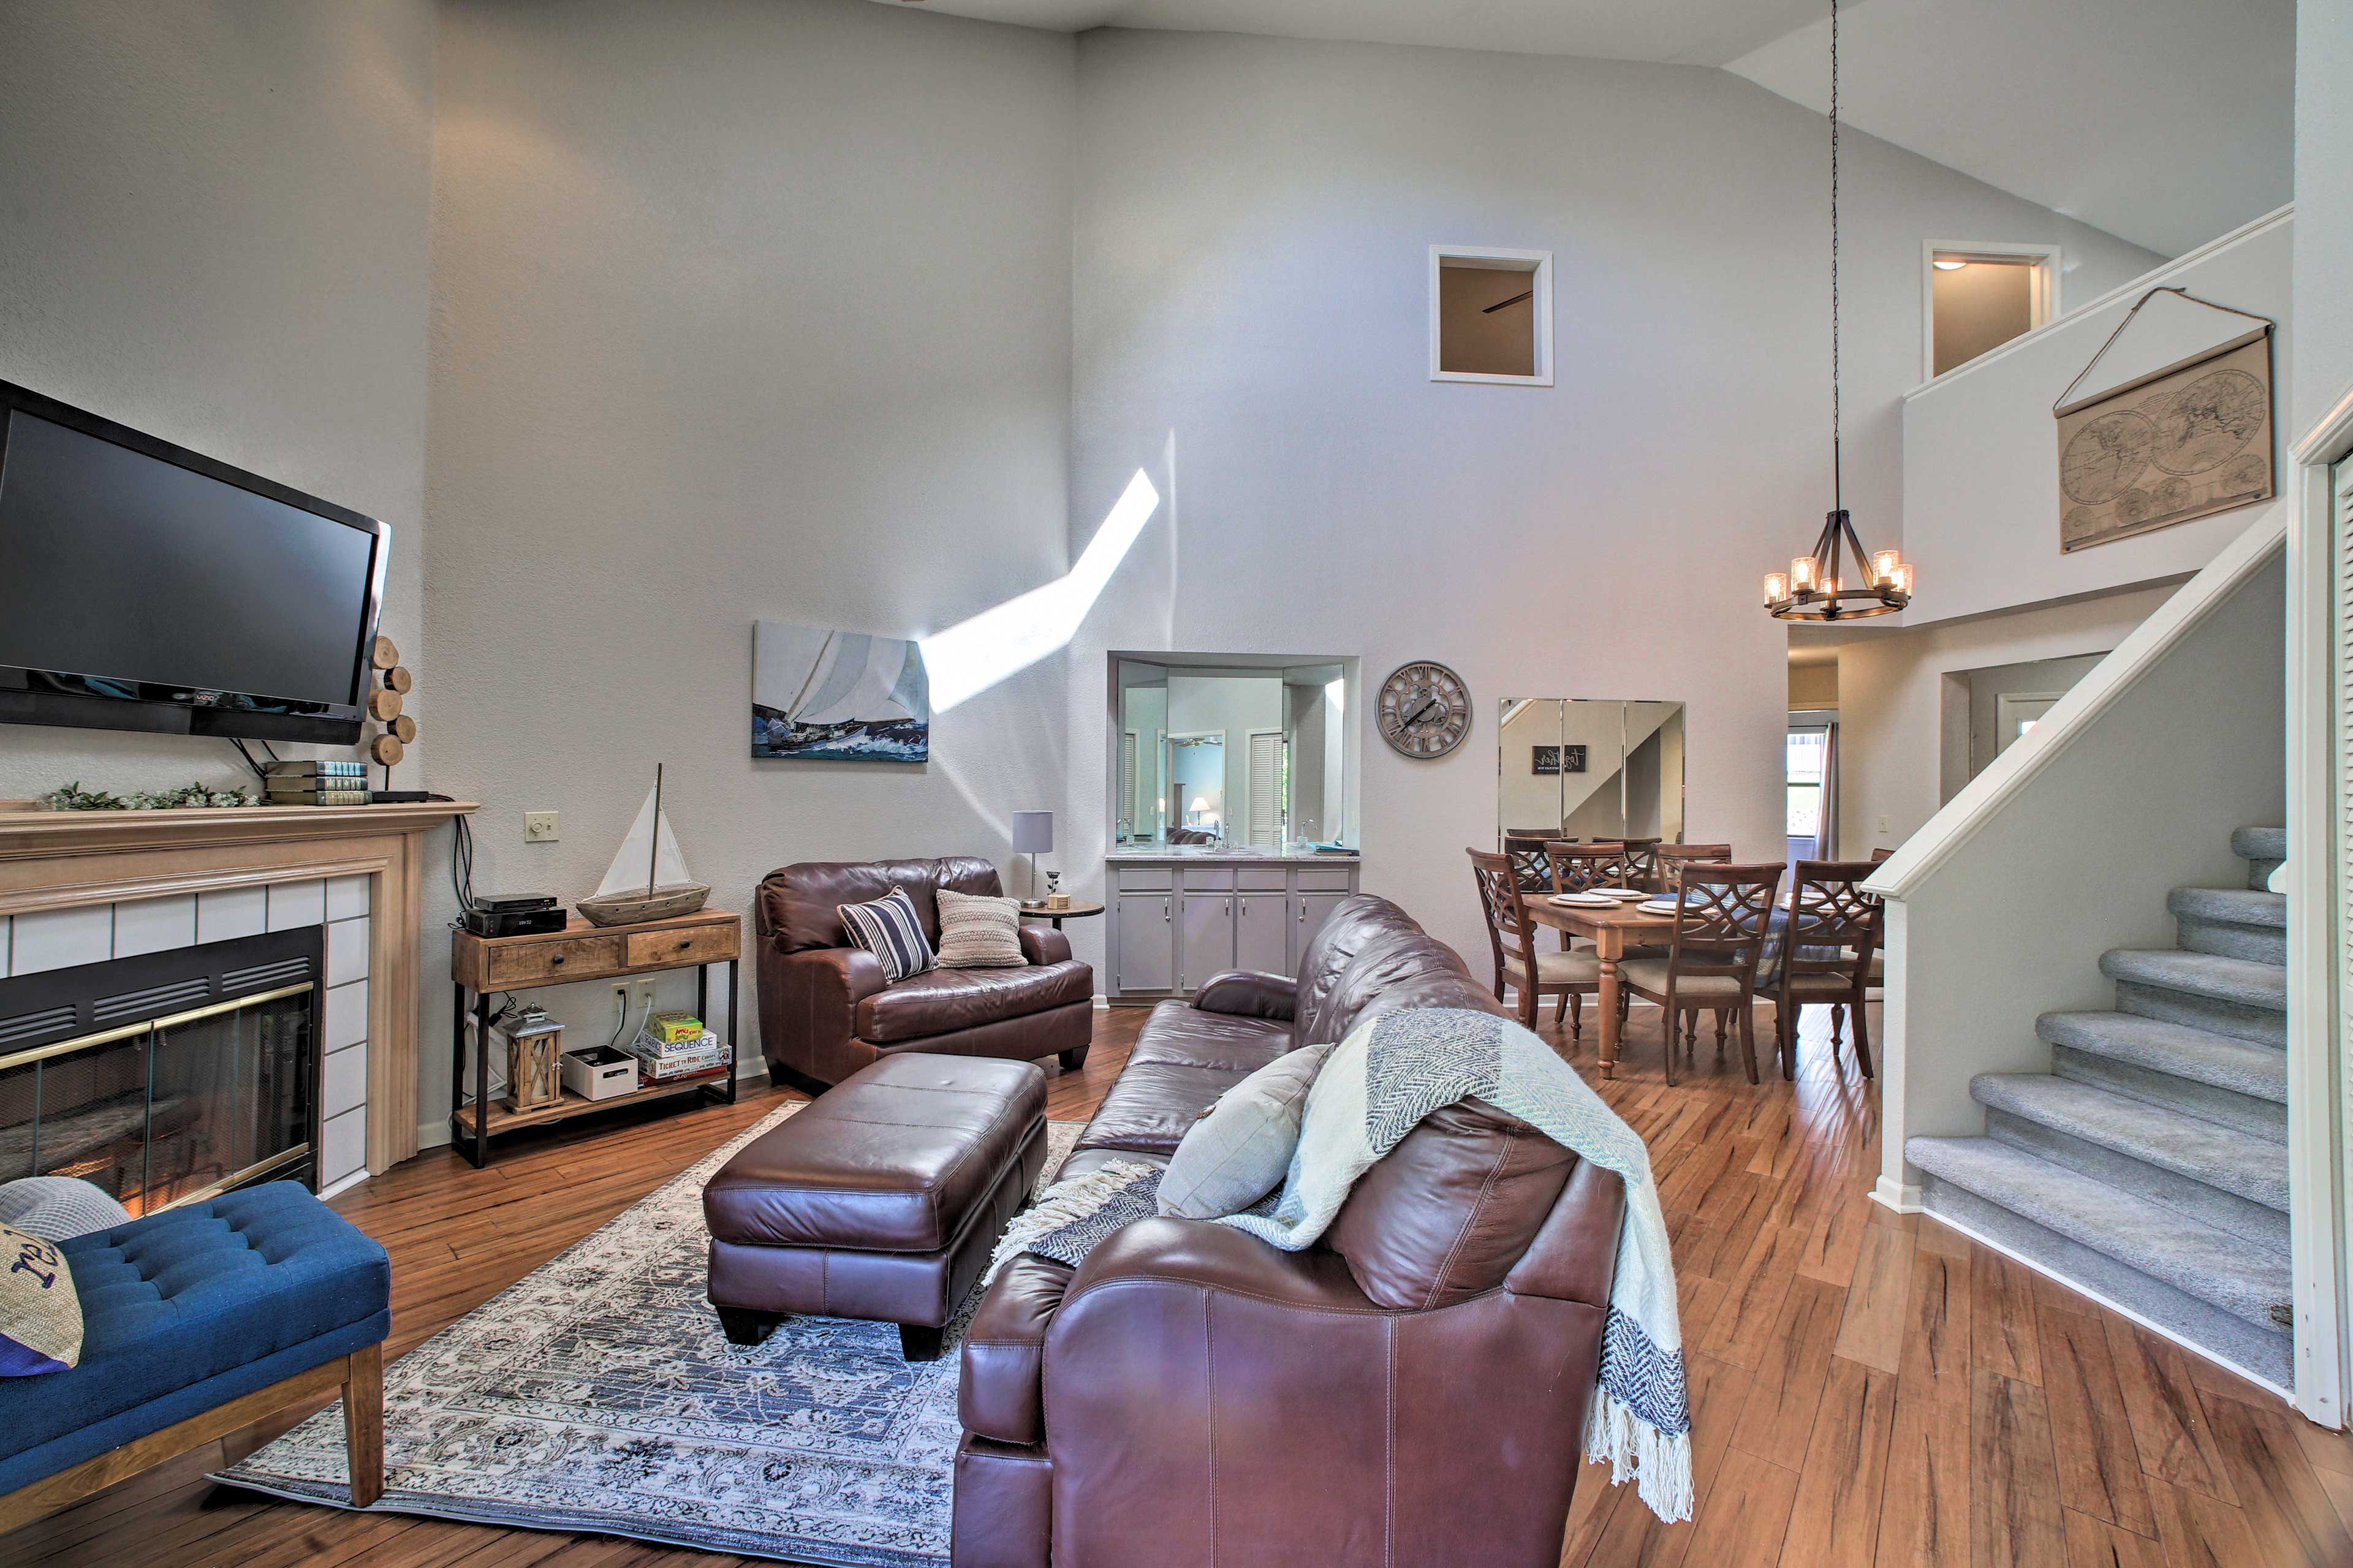 Hardwood floors and plush furnishings elevate this home.